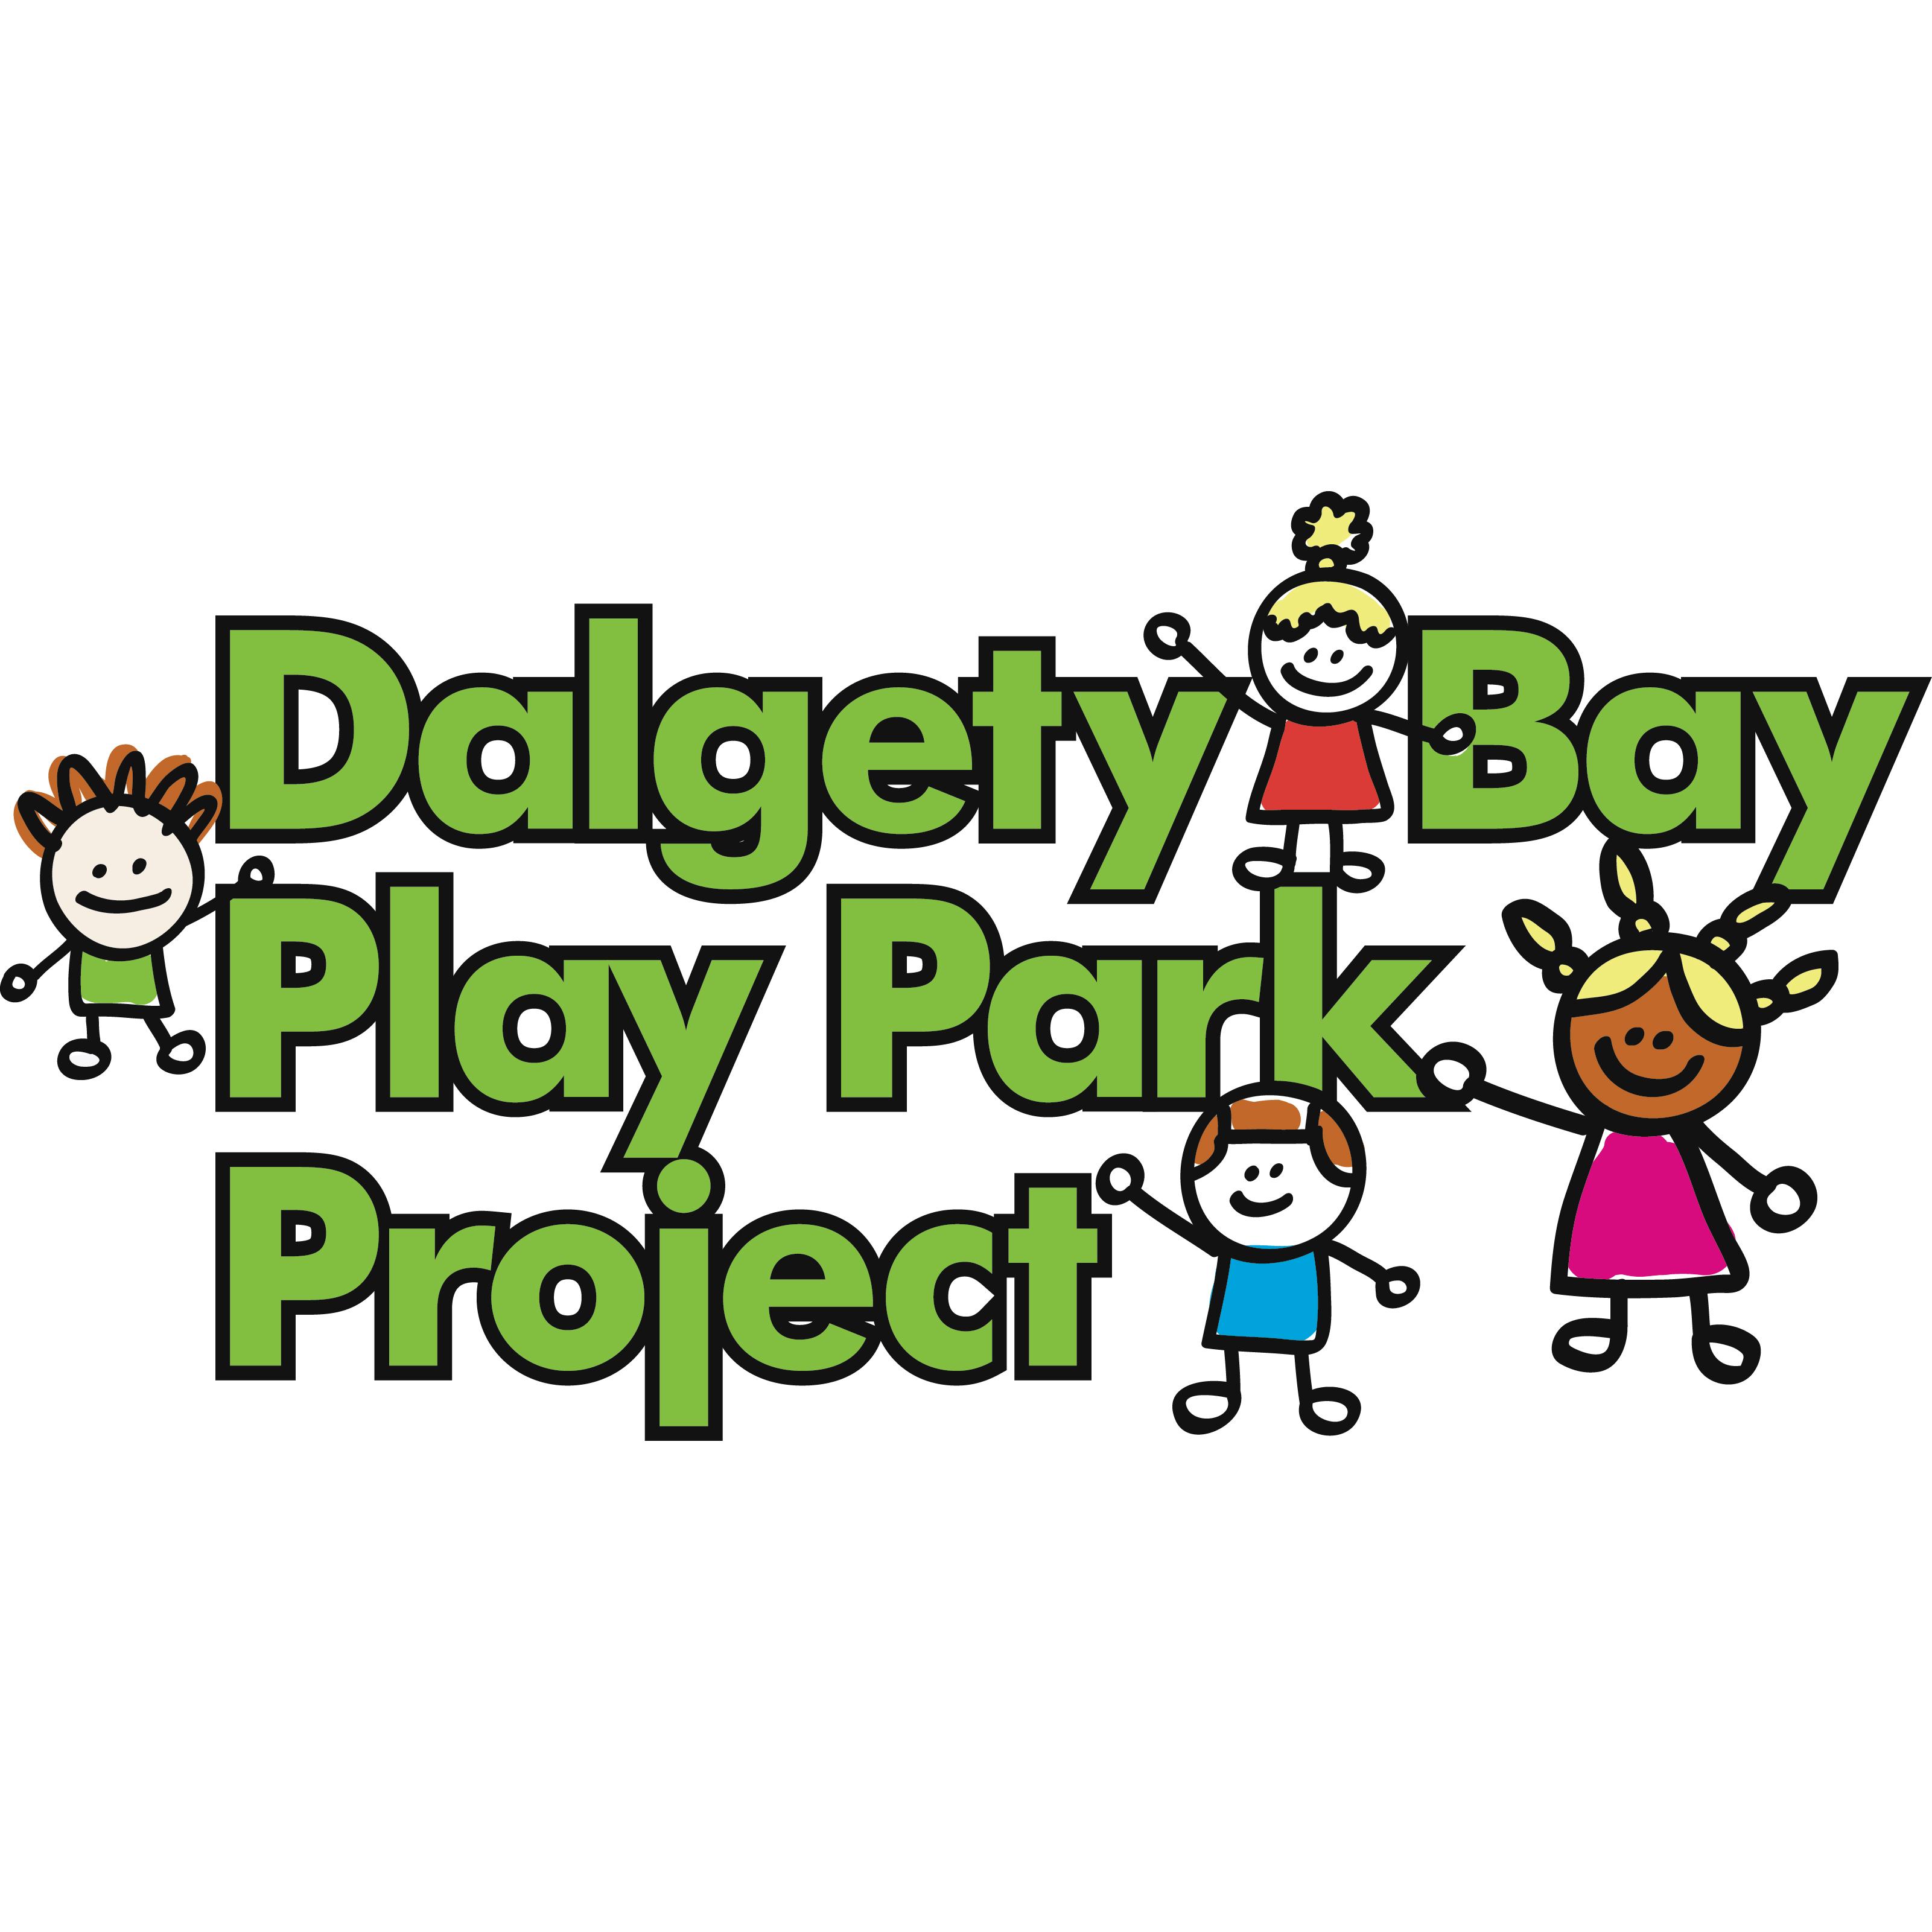 Dalgety Bay Play Park Project